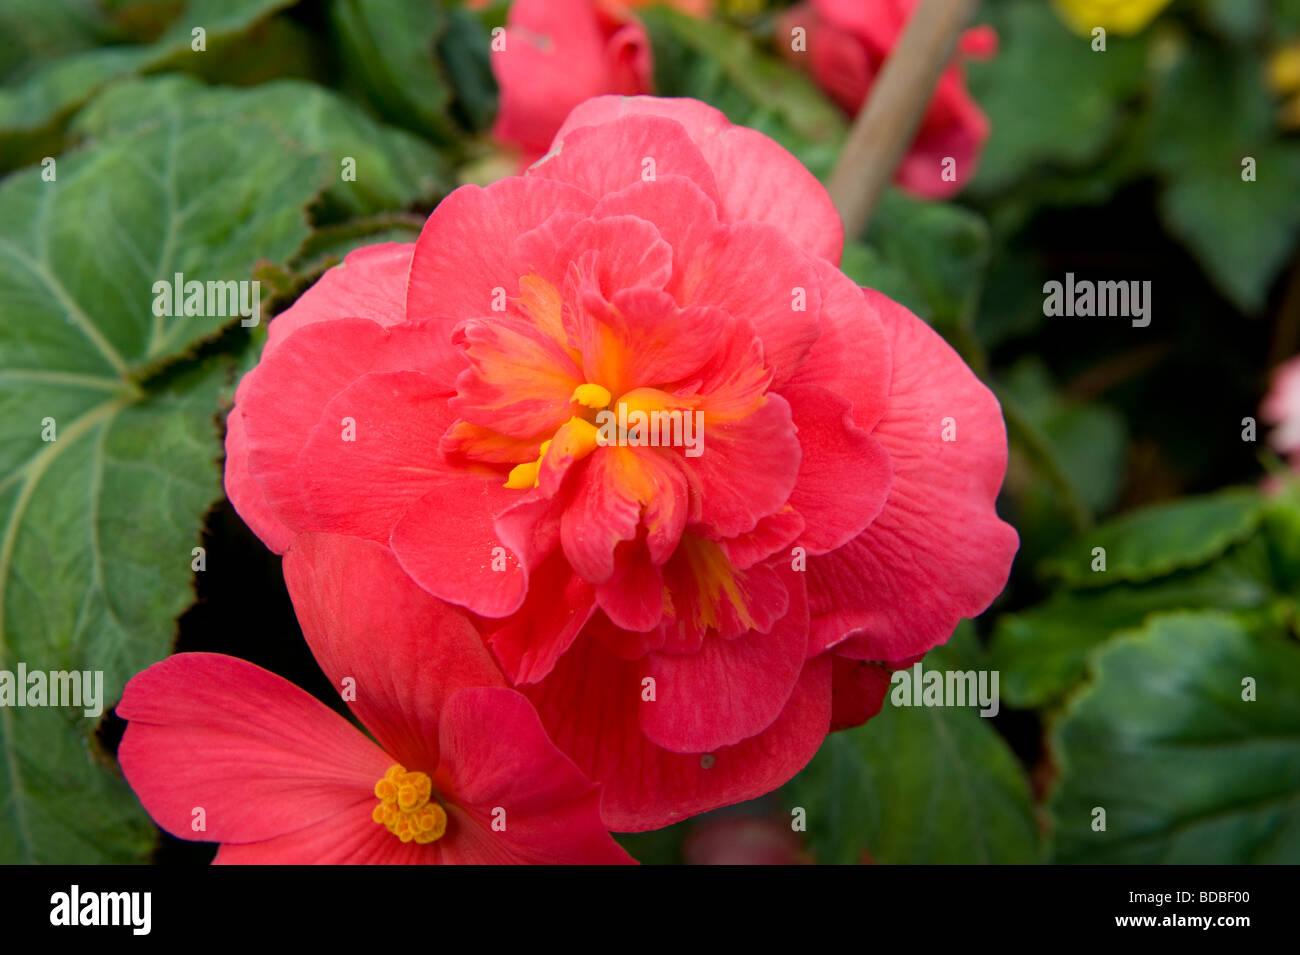 "Begonia Illumination Serie ""Beleuchtung Orange"" helle Blume in voller Blüte Stockbild"